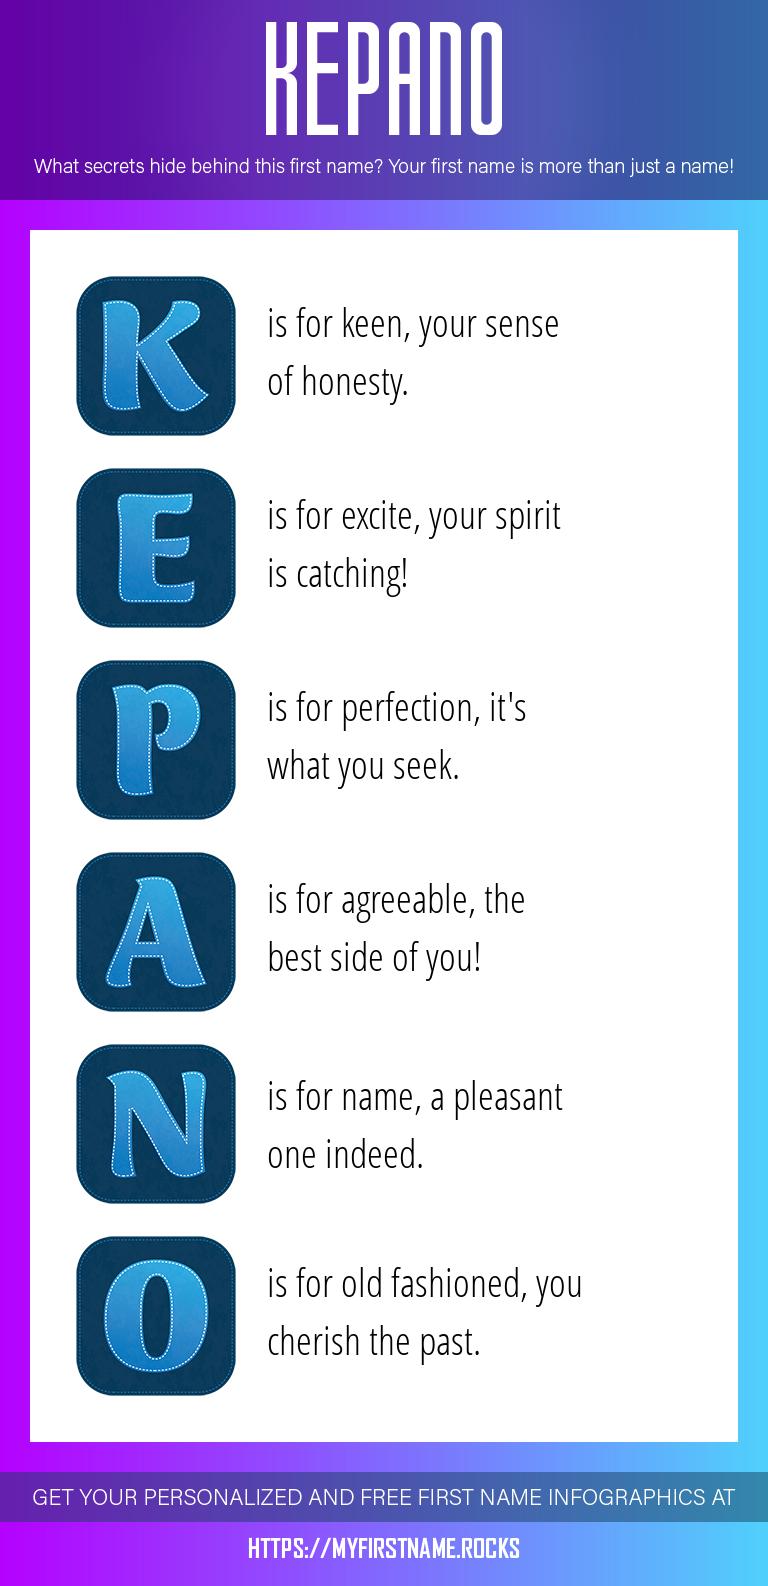 Kepano Infographics